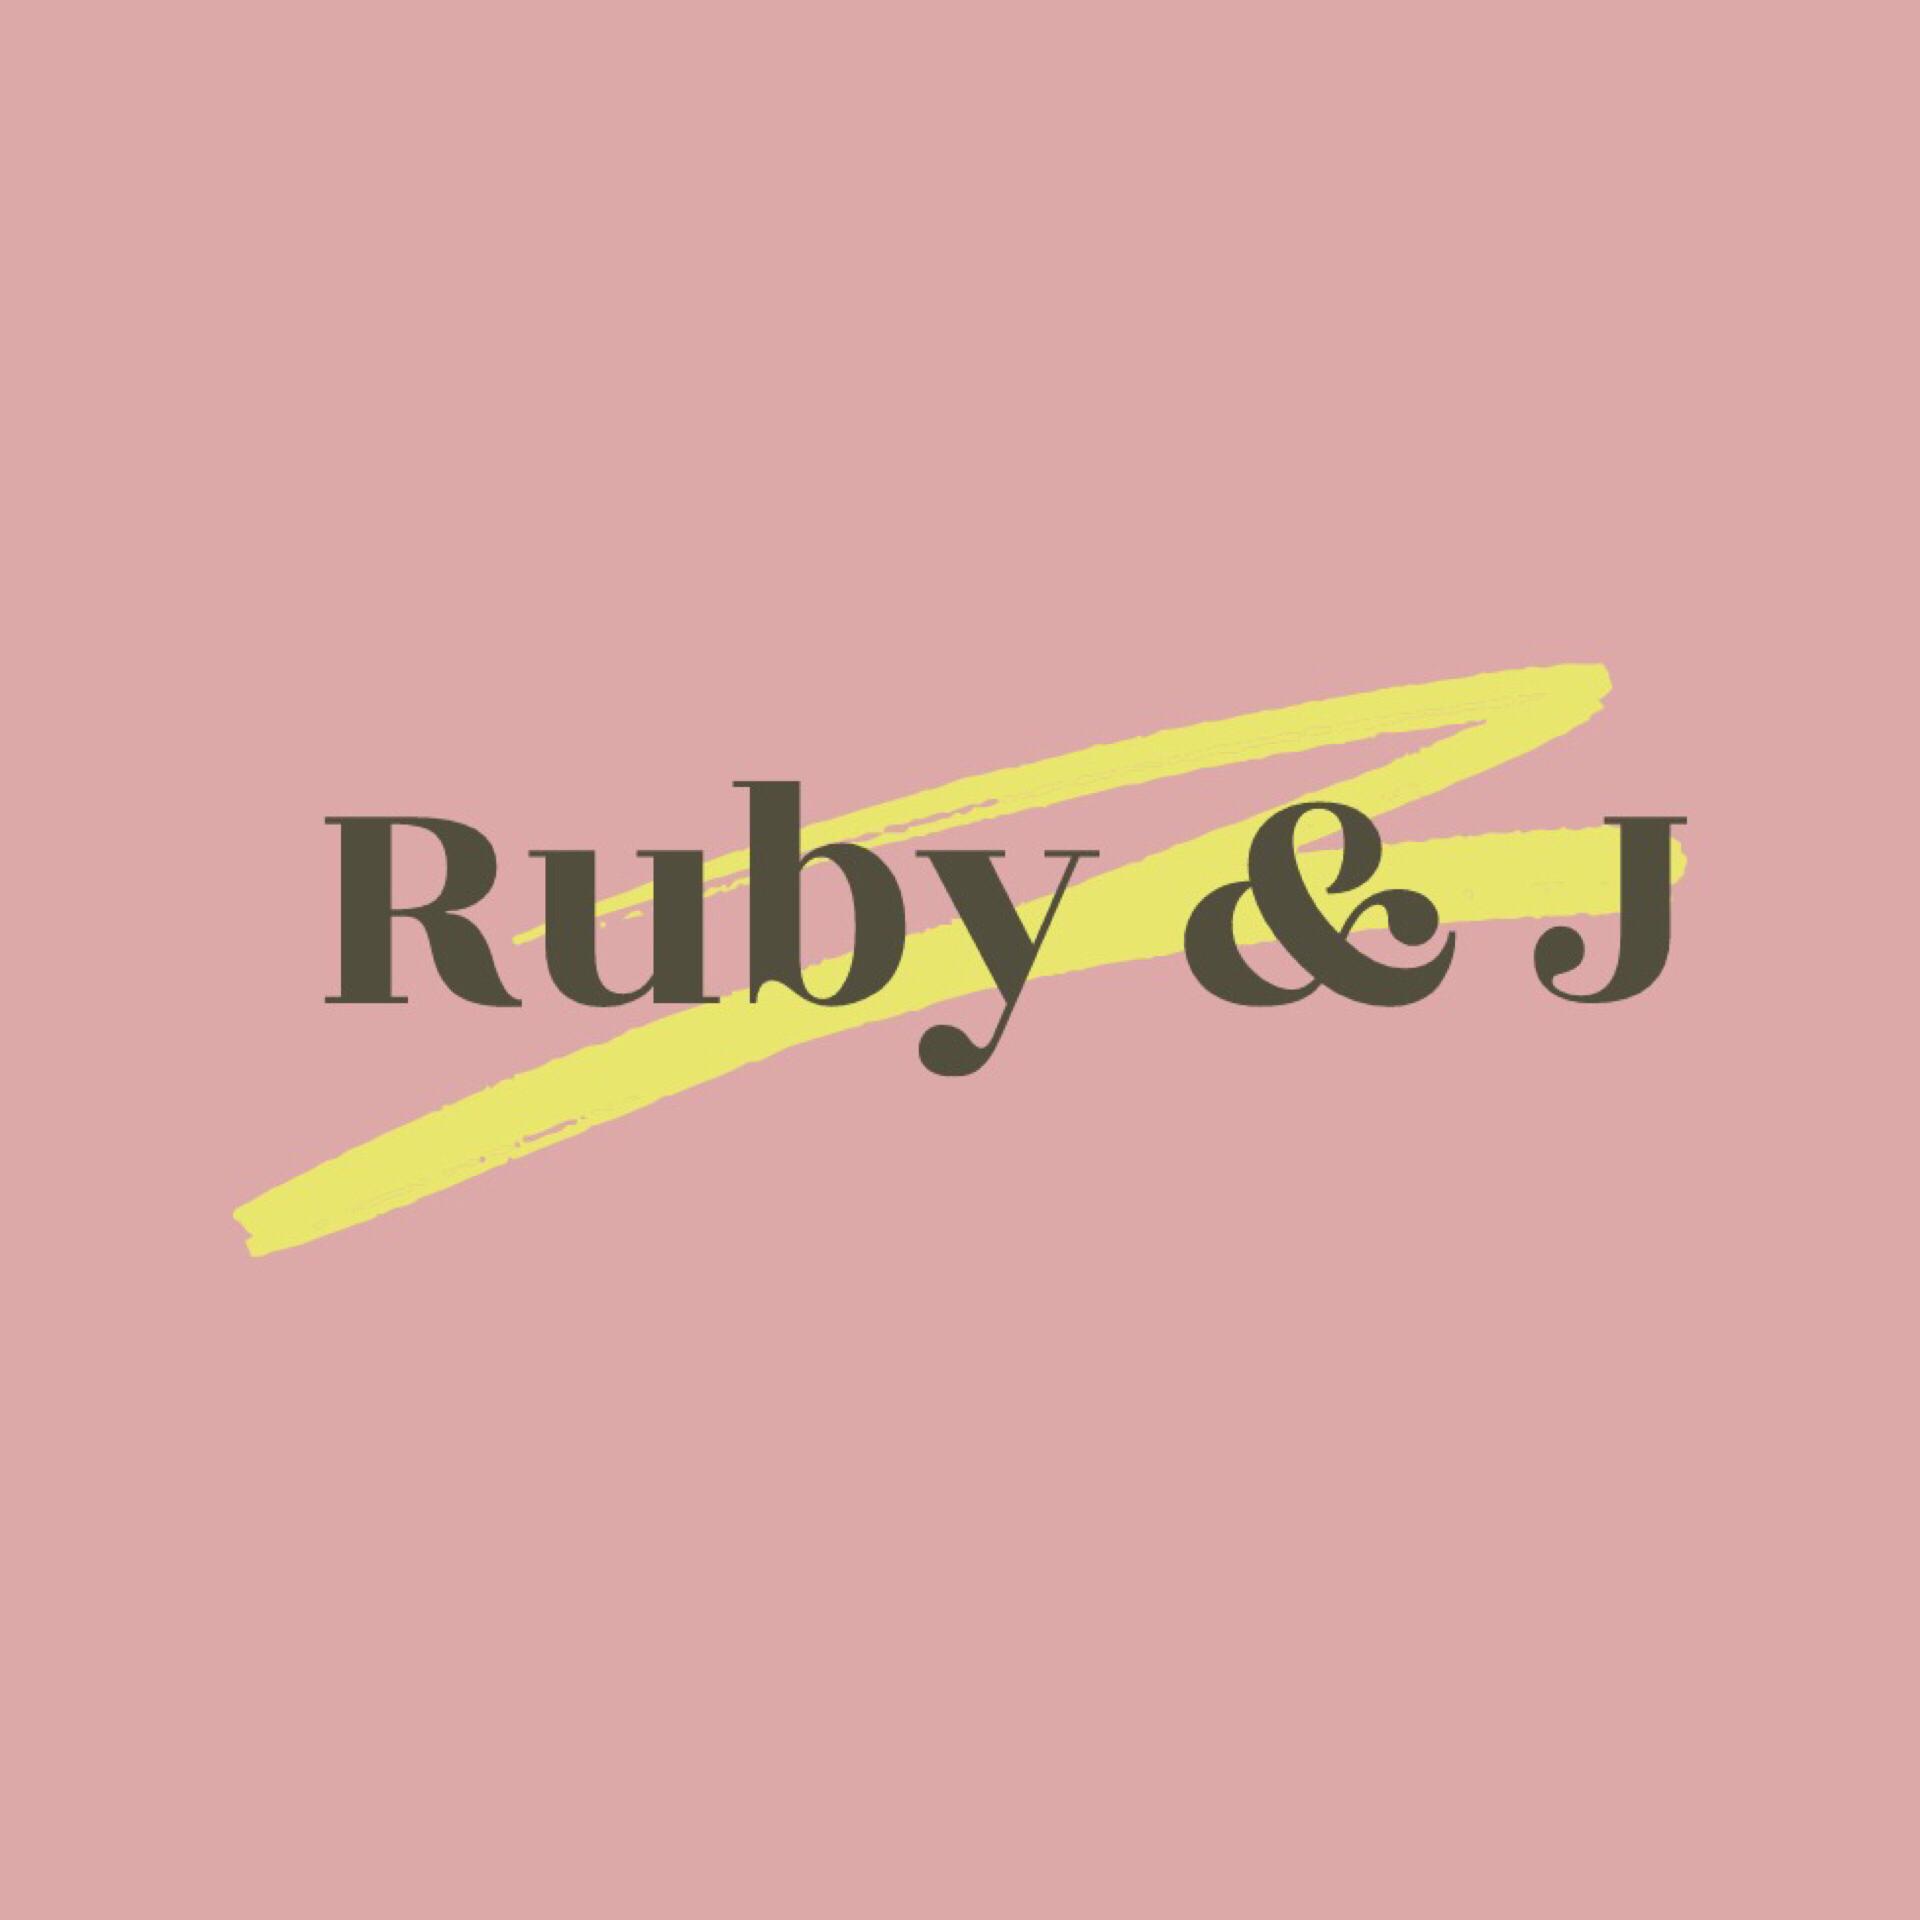 RubyandJ